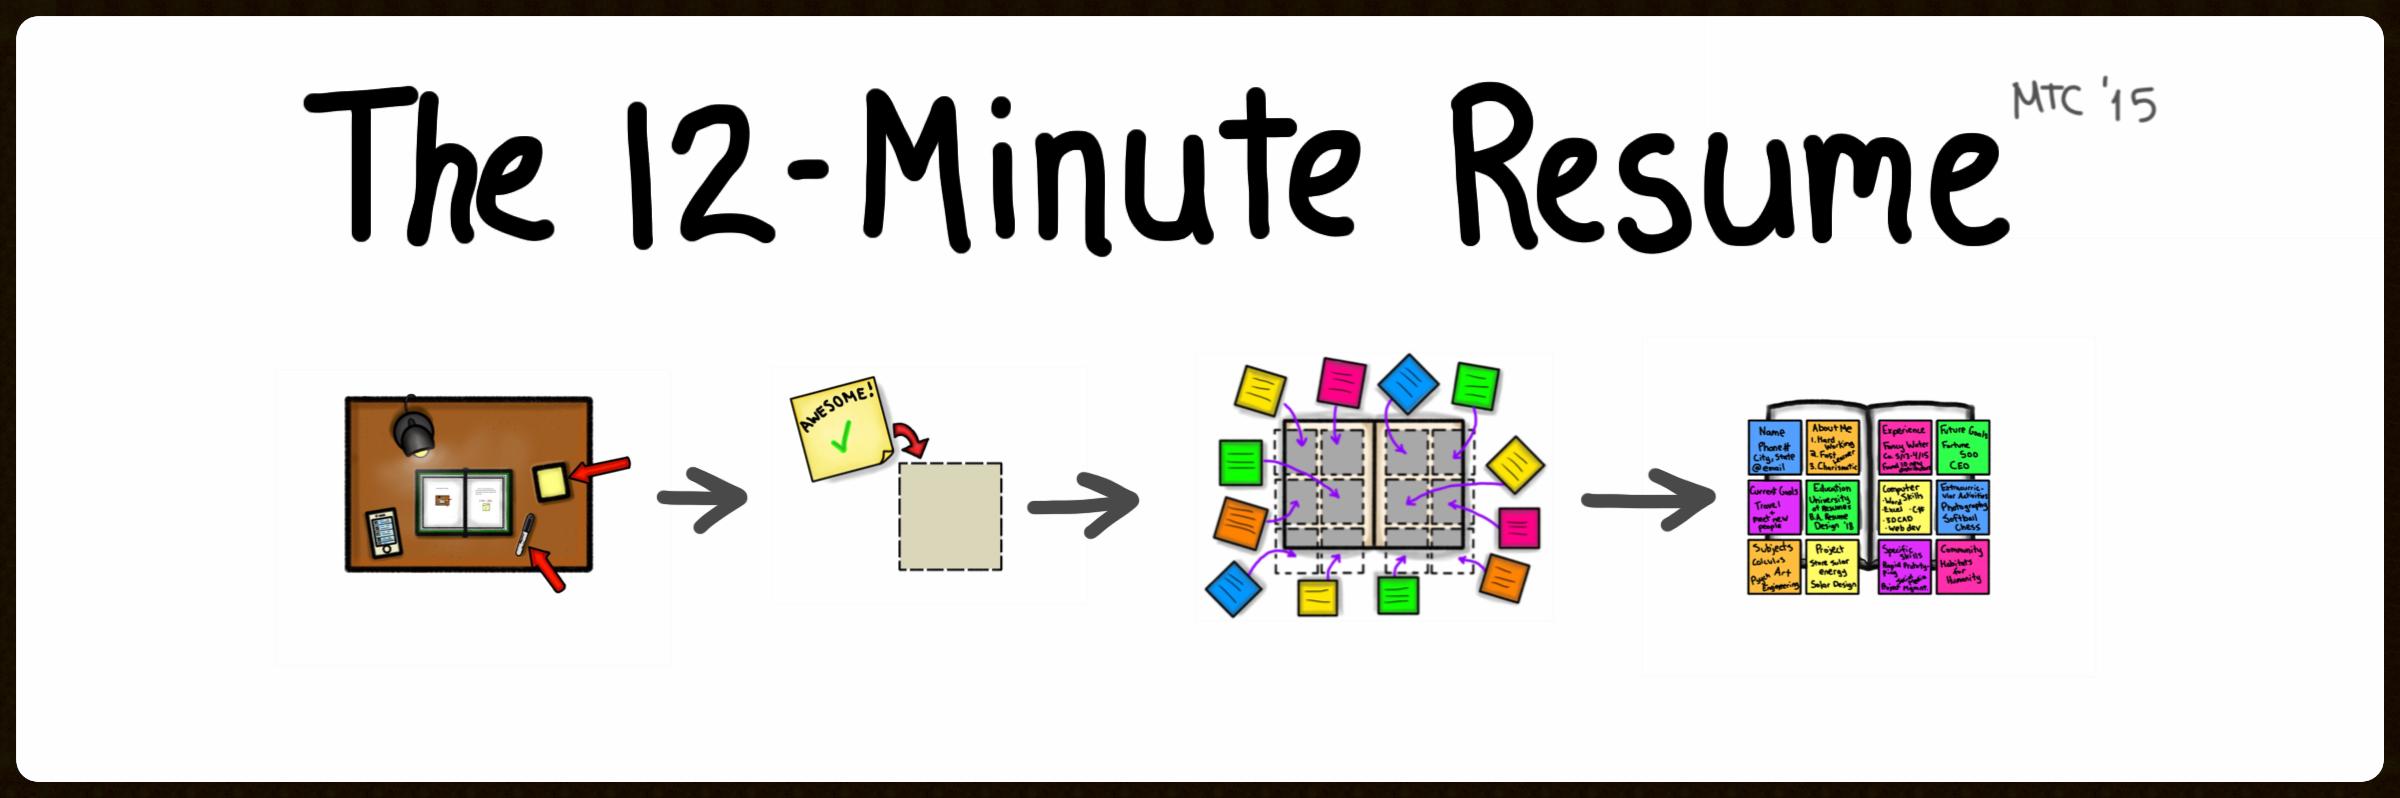 The 12-Minute Resume Tutorial Video